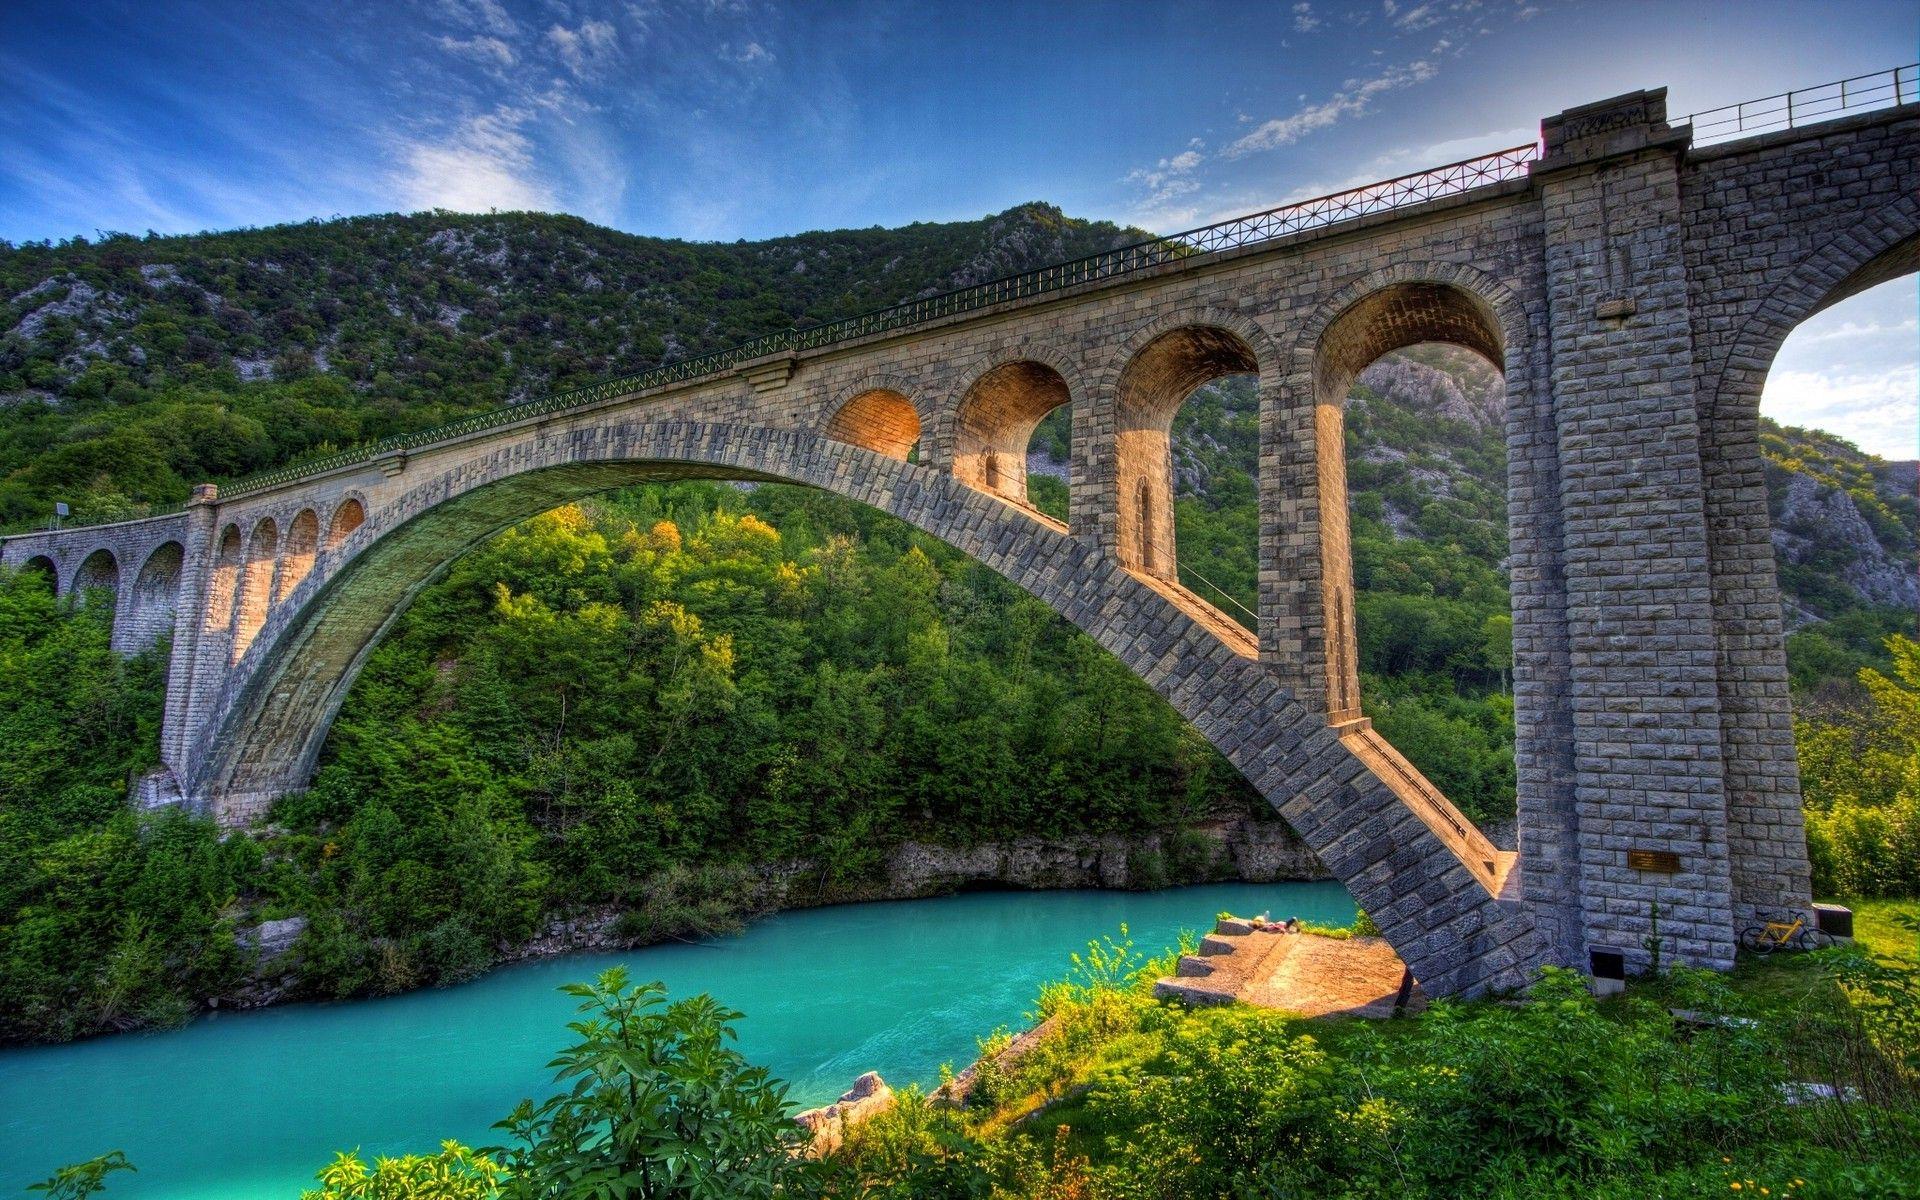 Nature, Landscape, Bridge, Architecture, River, Mountain, Forest